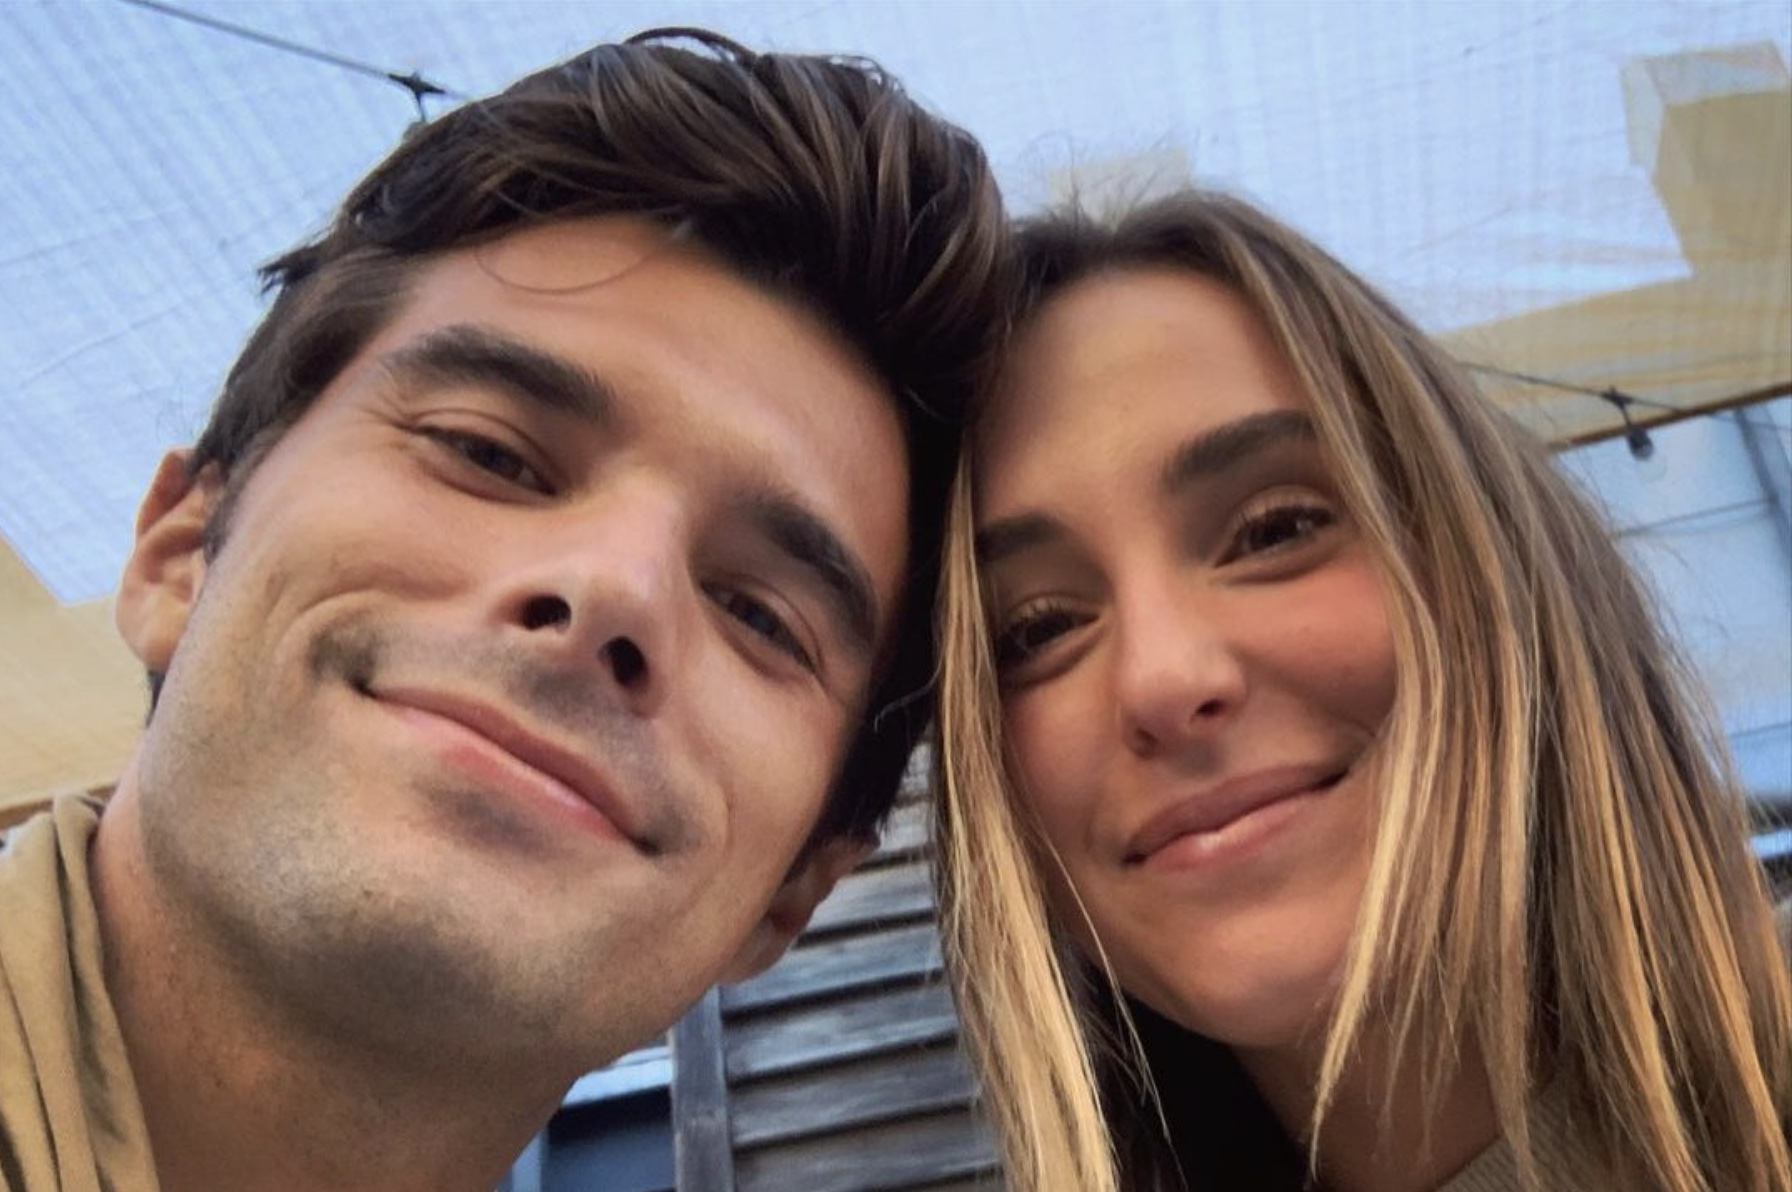 Josh, Lauren Swickard-https://www.instagram.com/p/CEh0niNFK76/